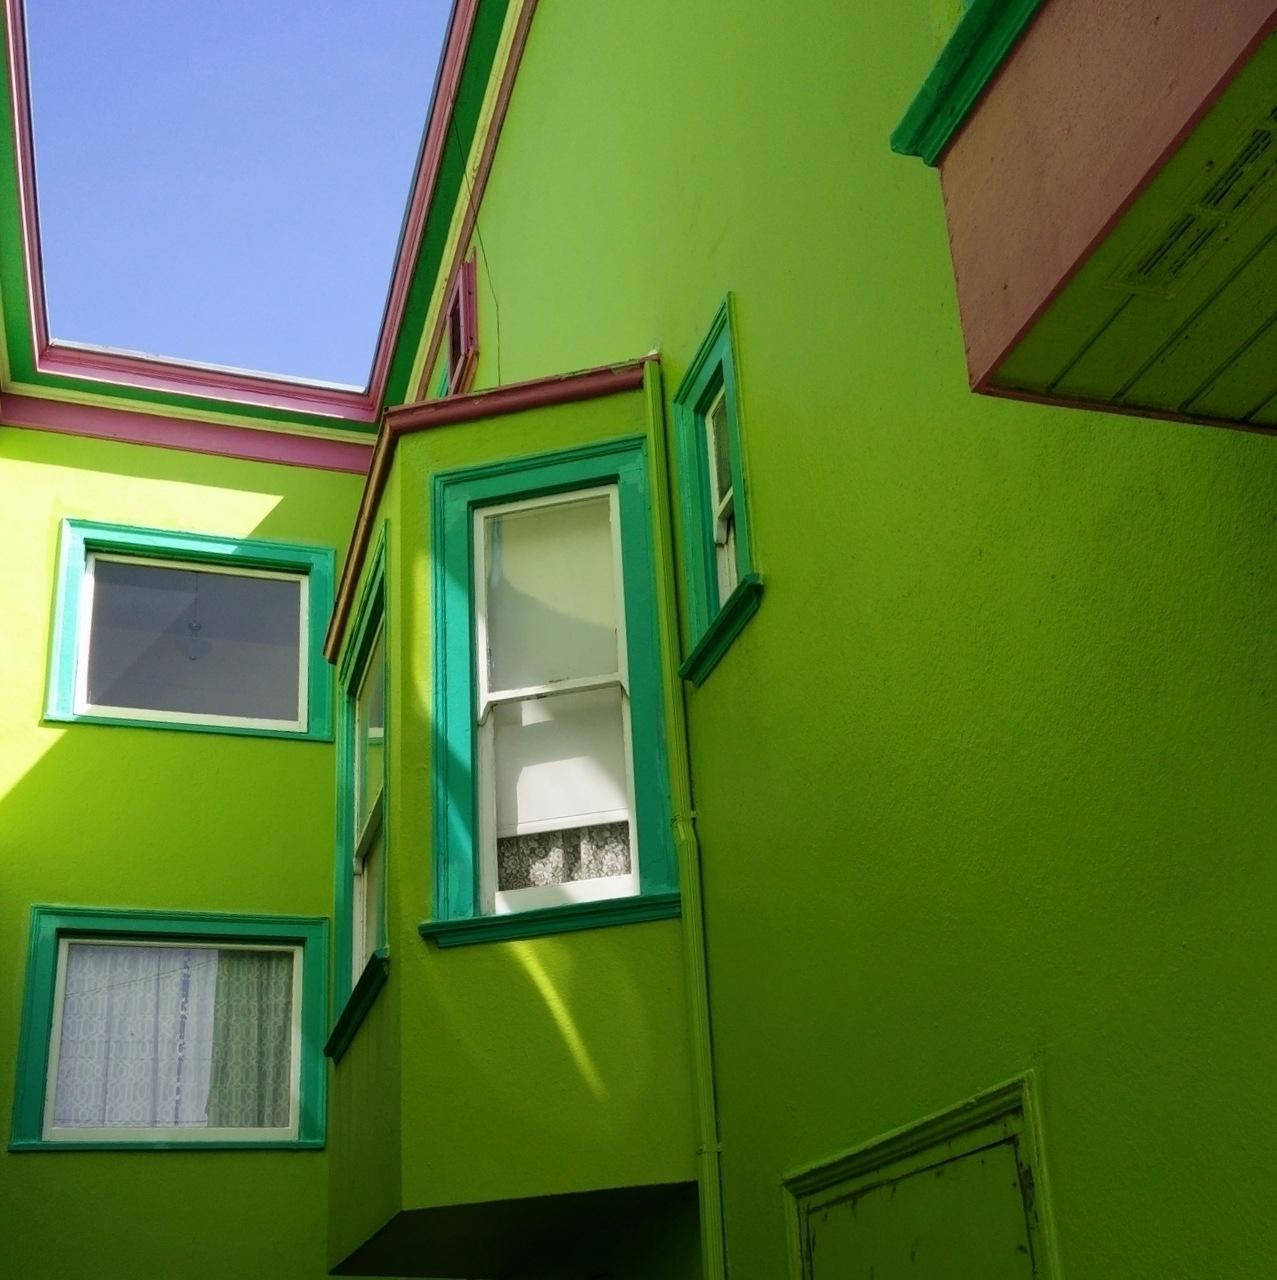 Blue - photography, apartments, housing - voiceofsf | ello